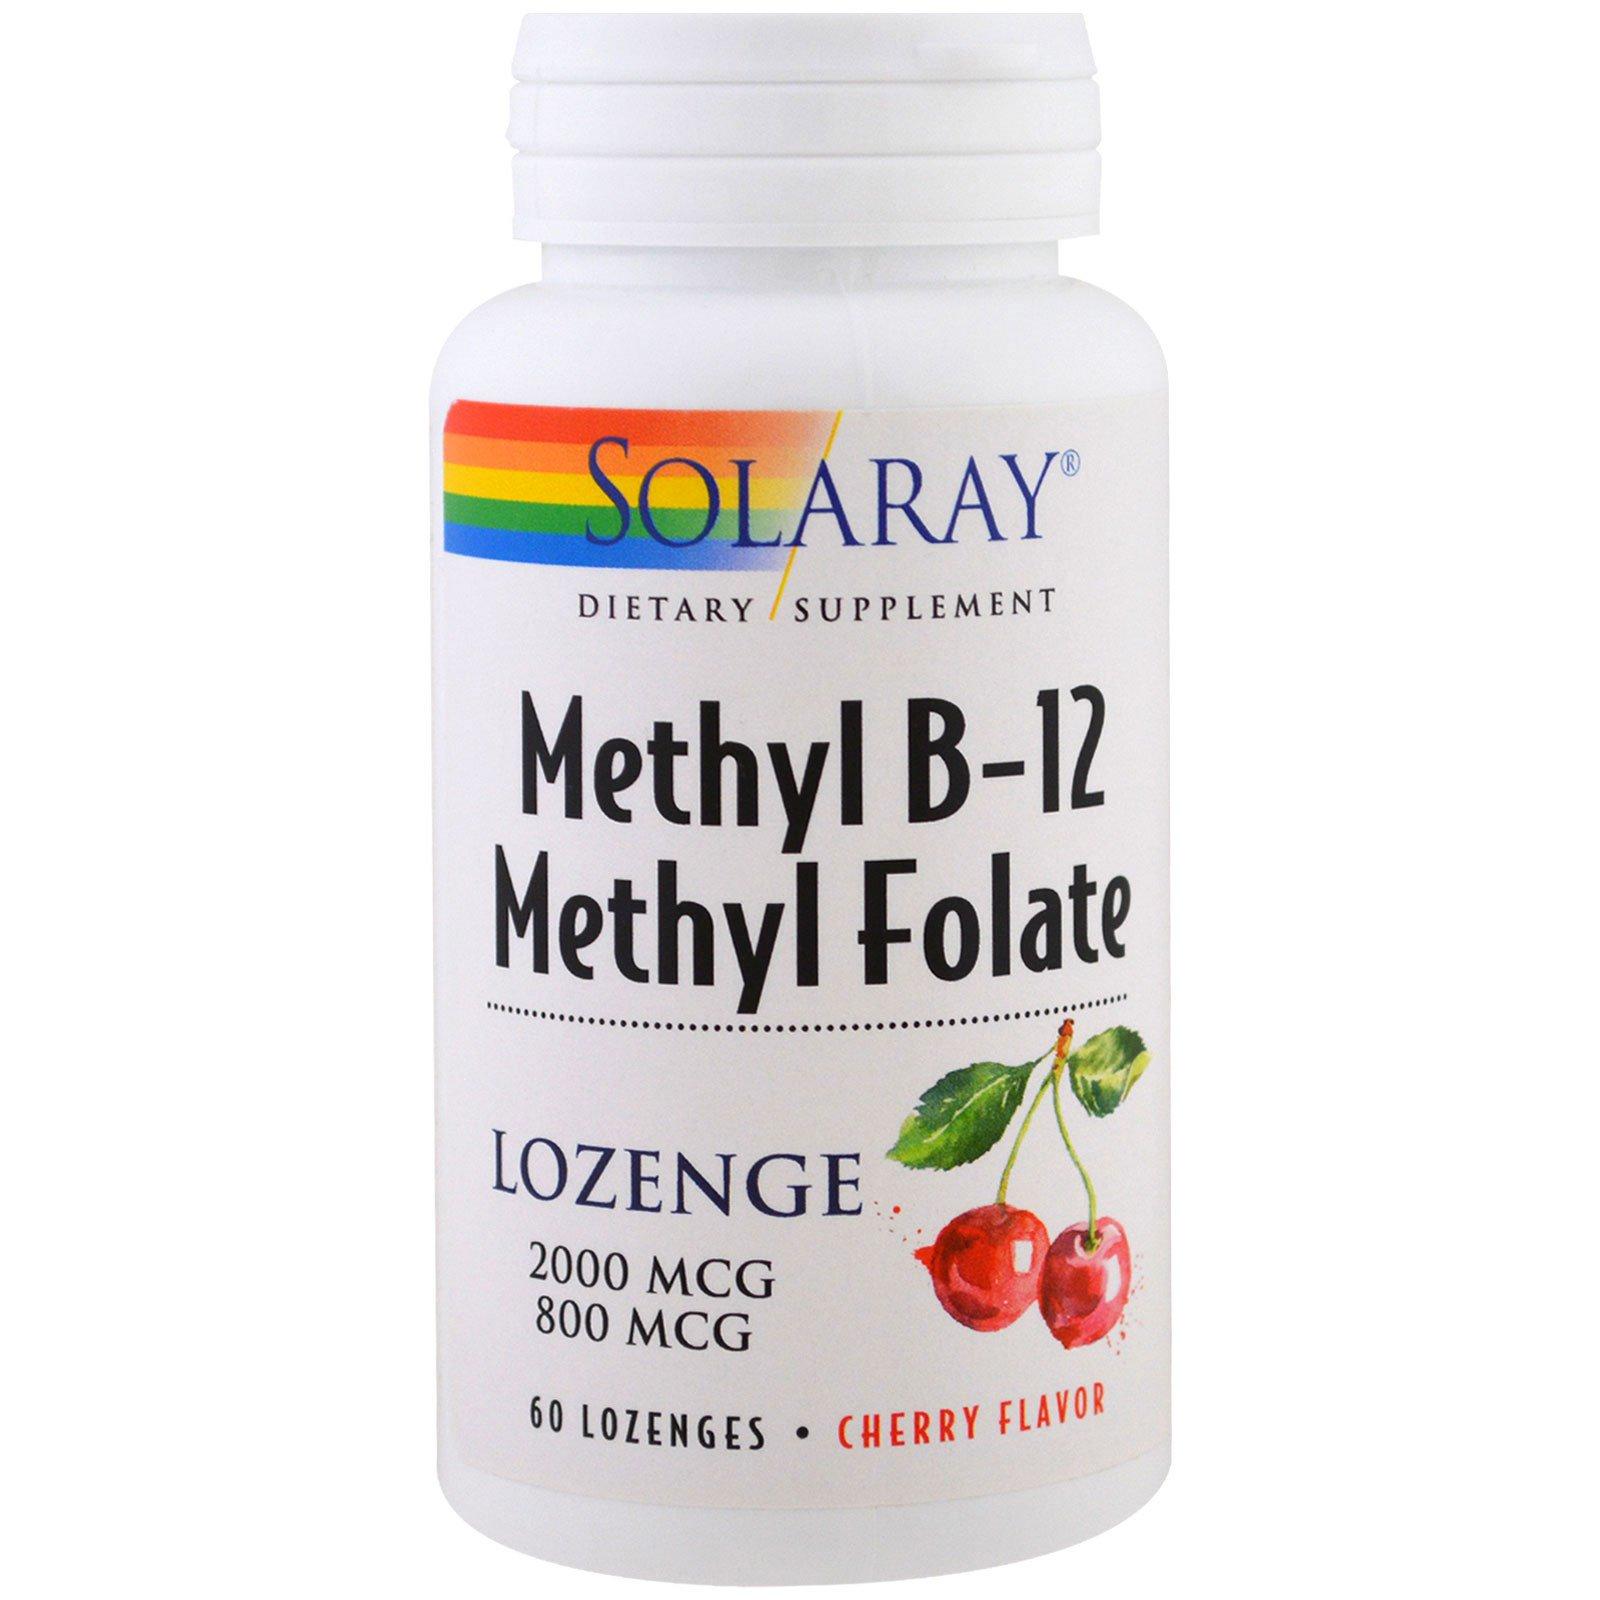 Solaray, Метил B-12 метил-фолат, Вишневый вкус, 60 пастилок